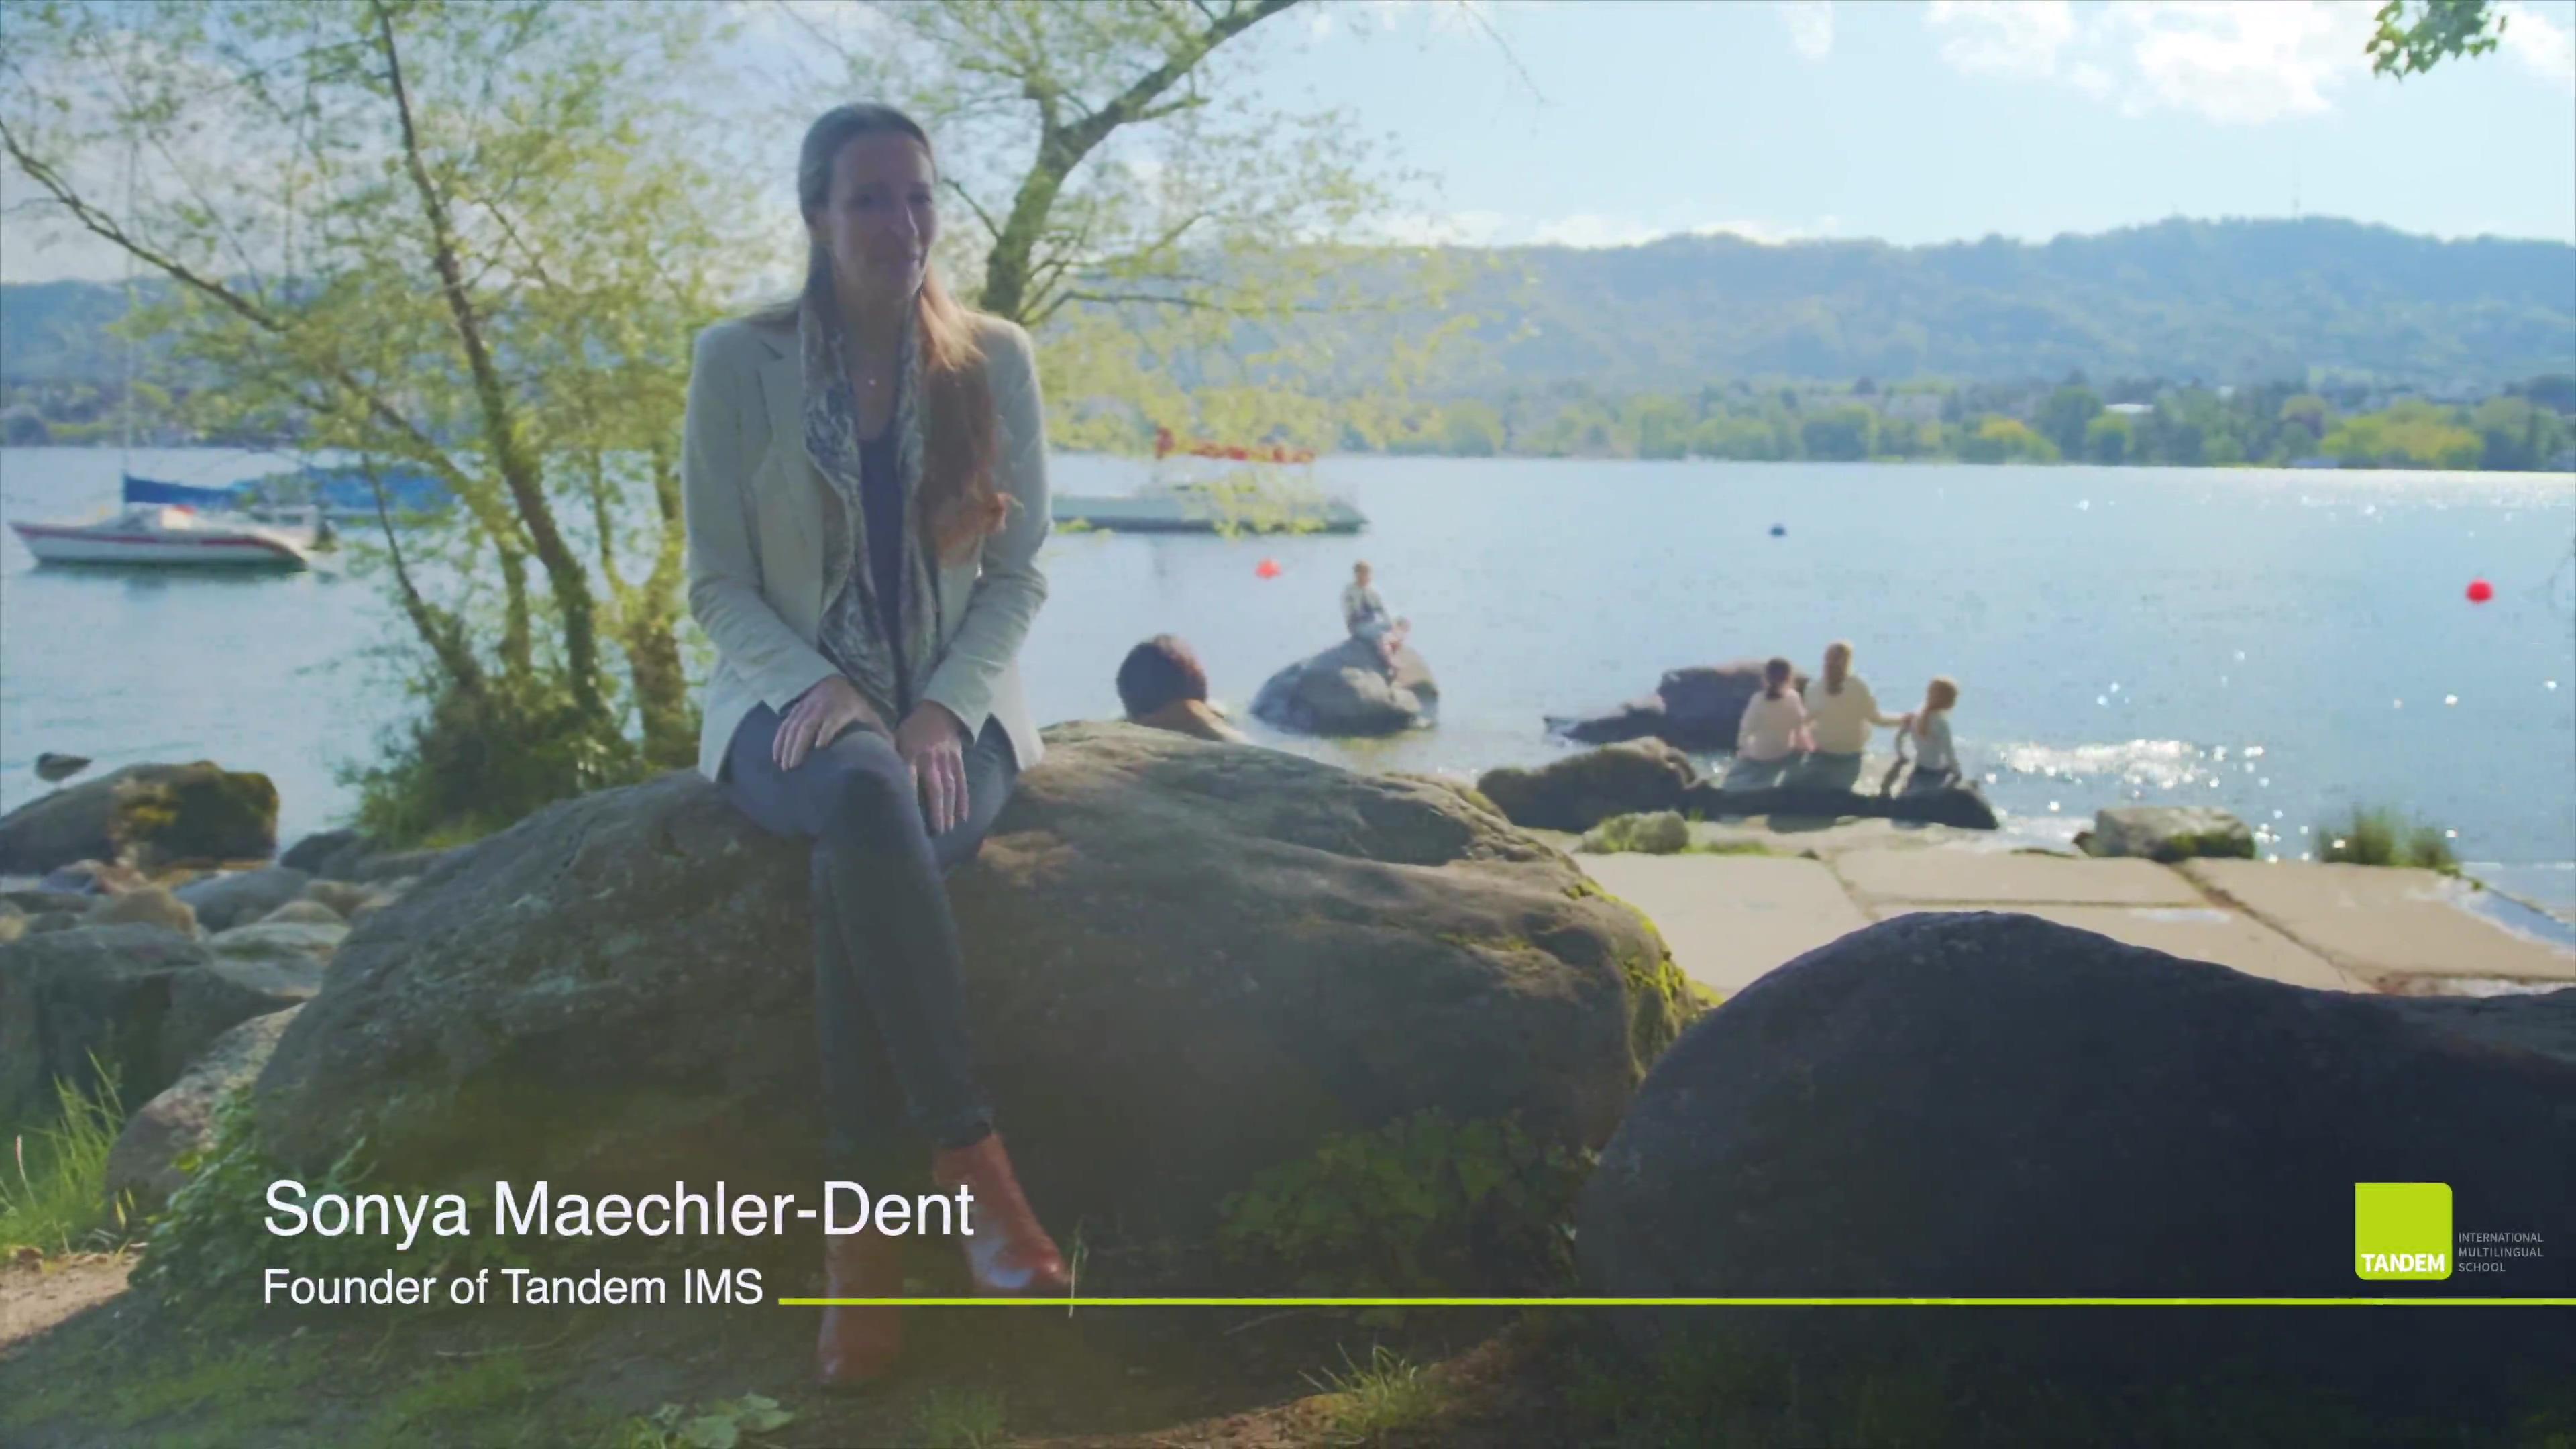 Interview_Sonya_Maehler_Dent_TandemIMS